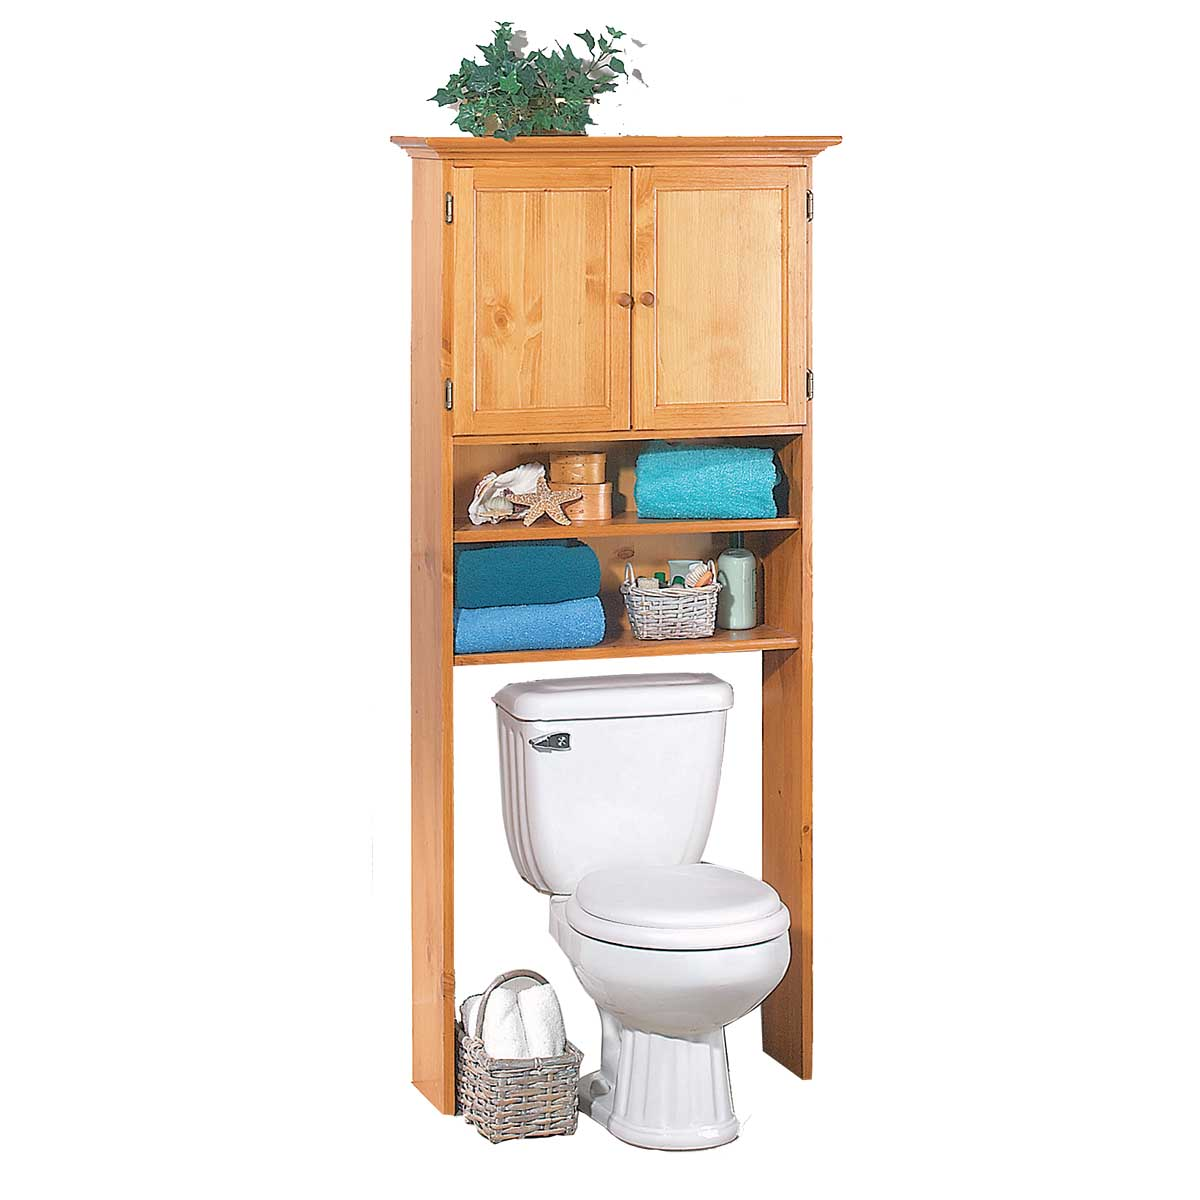 toilet shelf storage bathroom heirloom pine